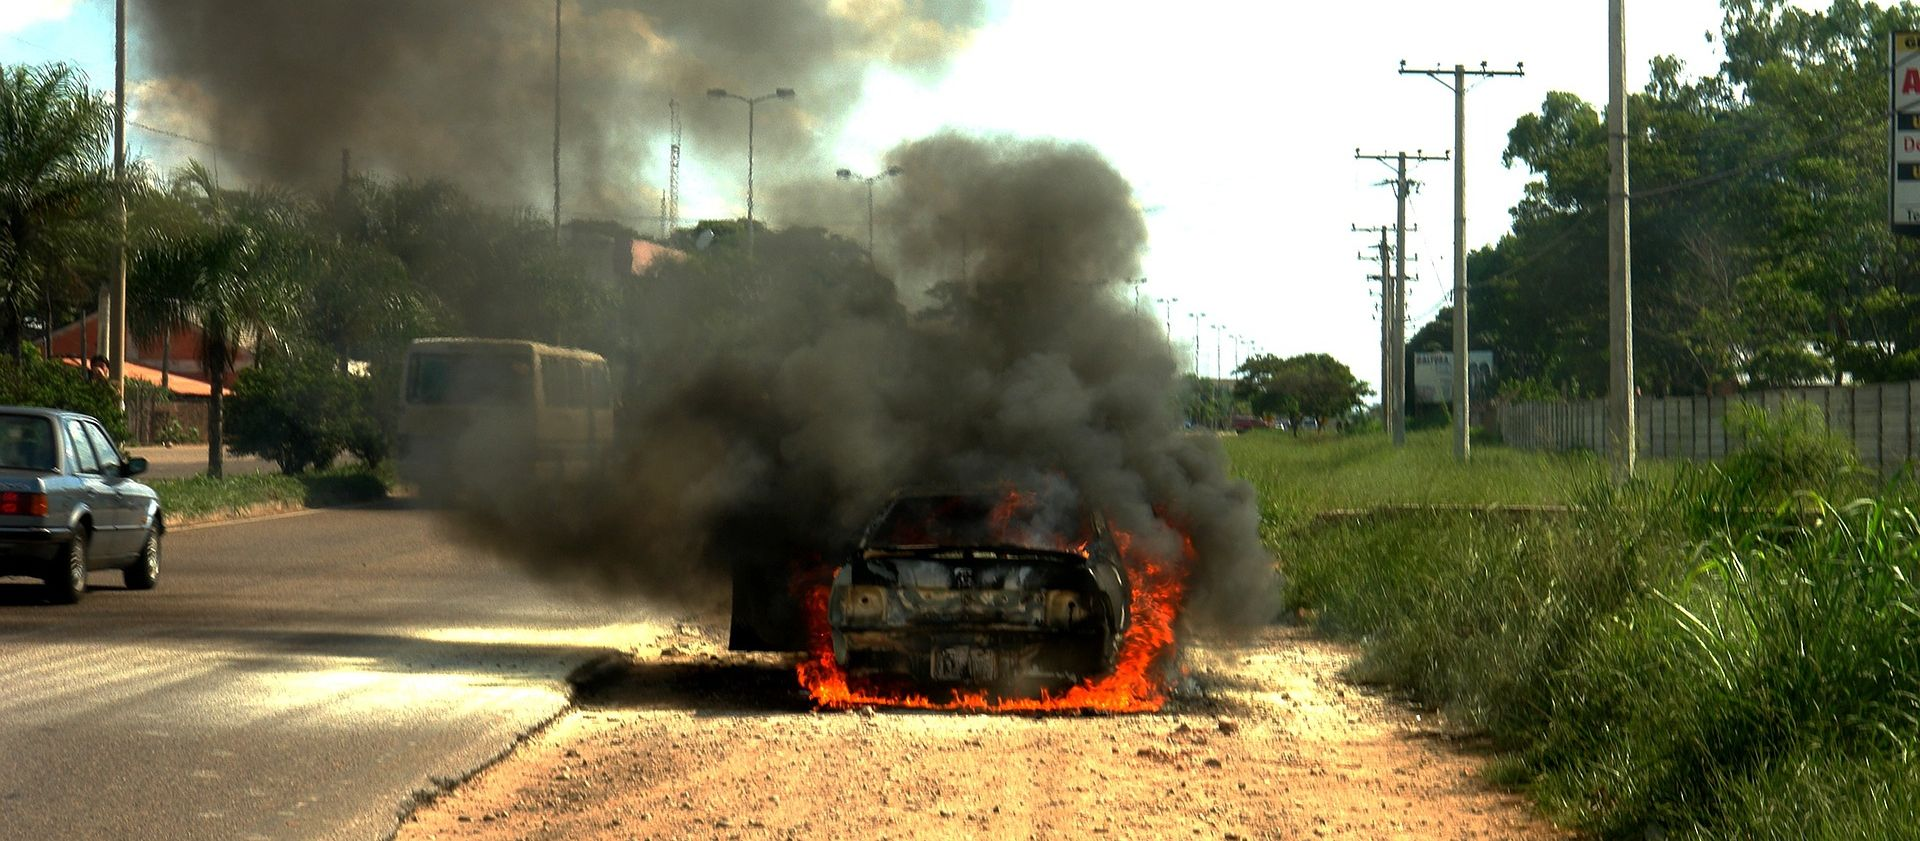 TAJLAND Kombi se zabio u kamionet i zapalio, poginulo 25 osoba